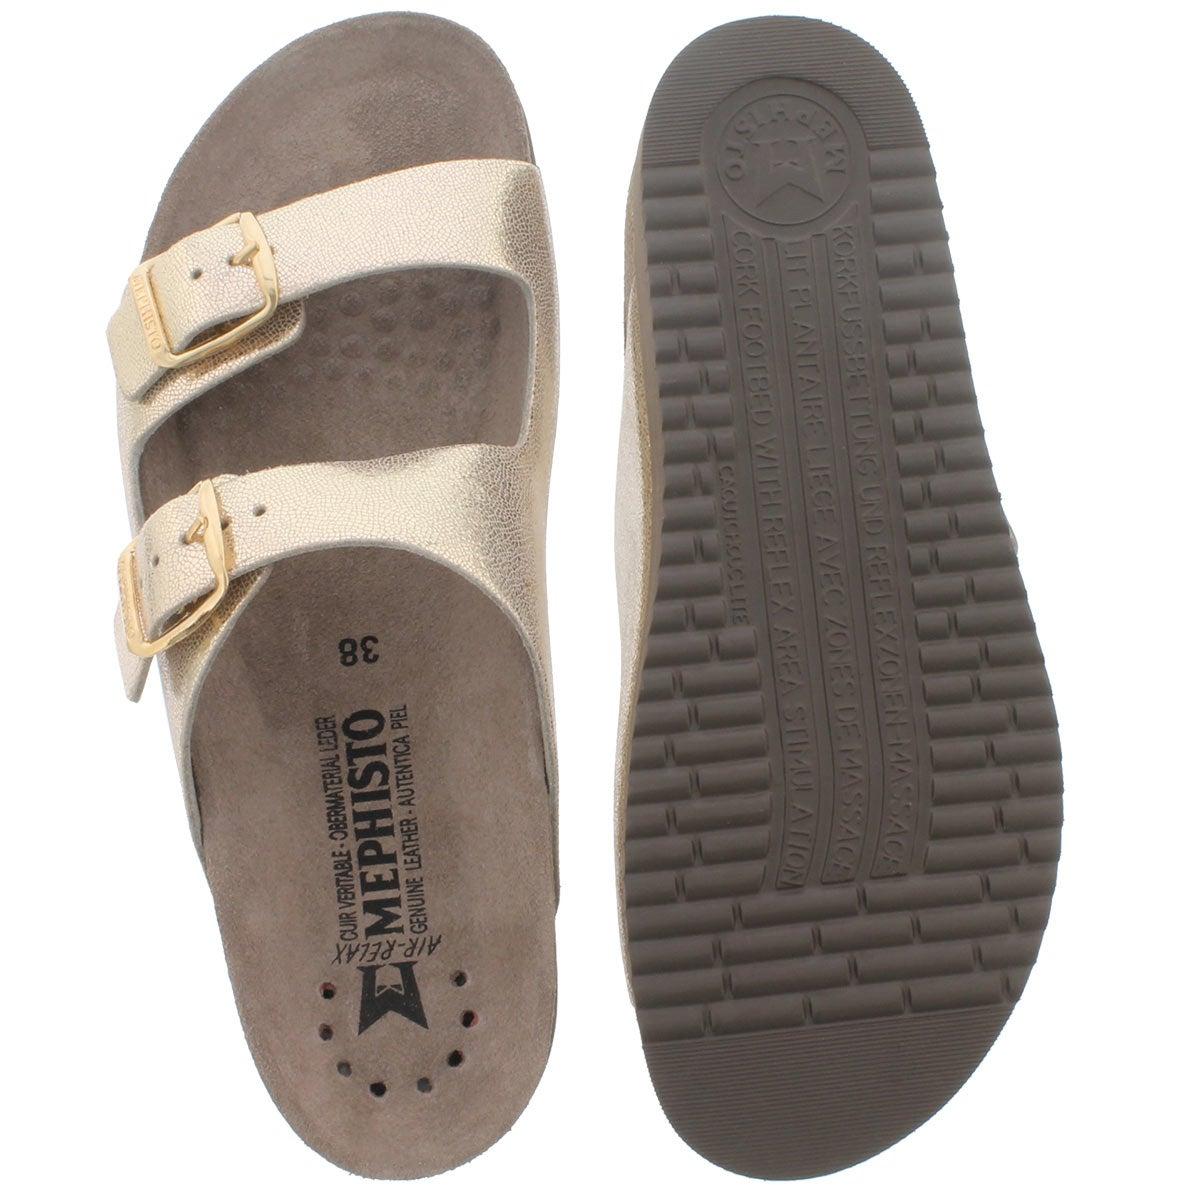 Lds Harmony platinum cork footbed slide